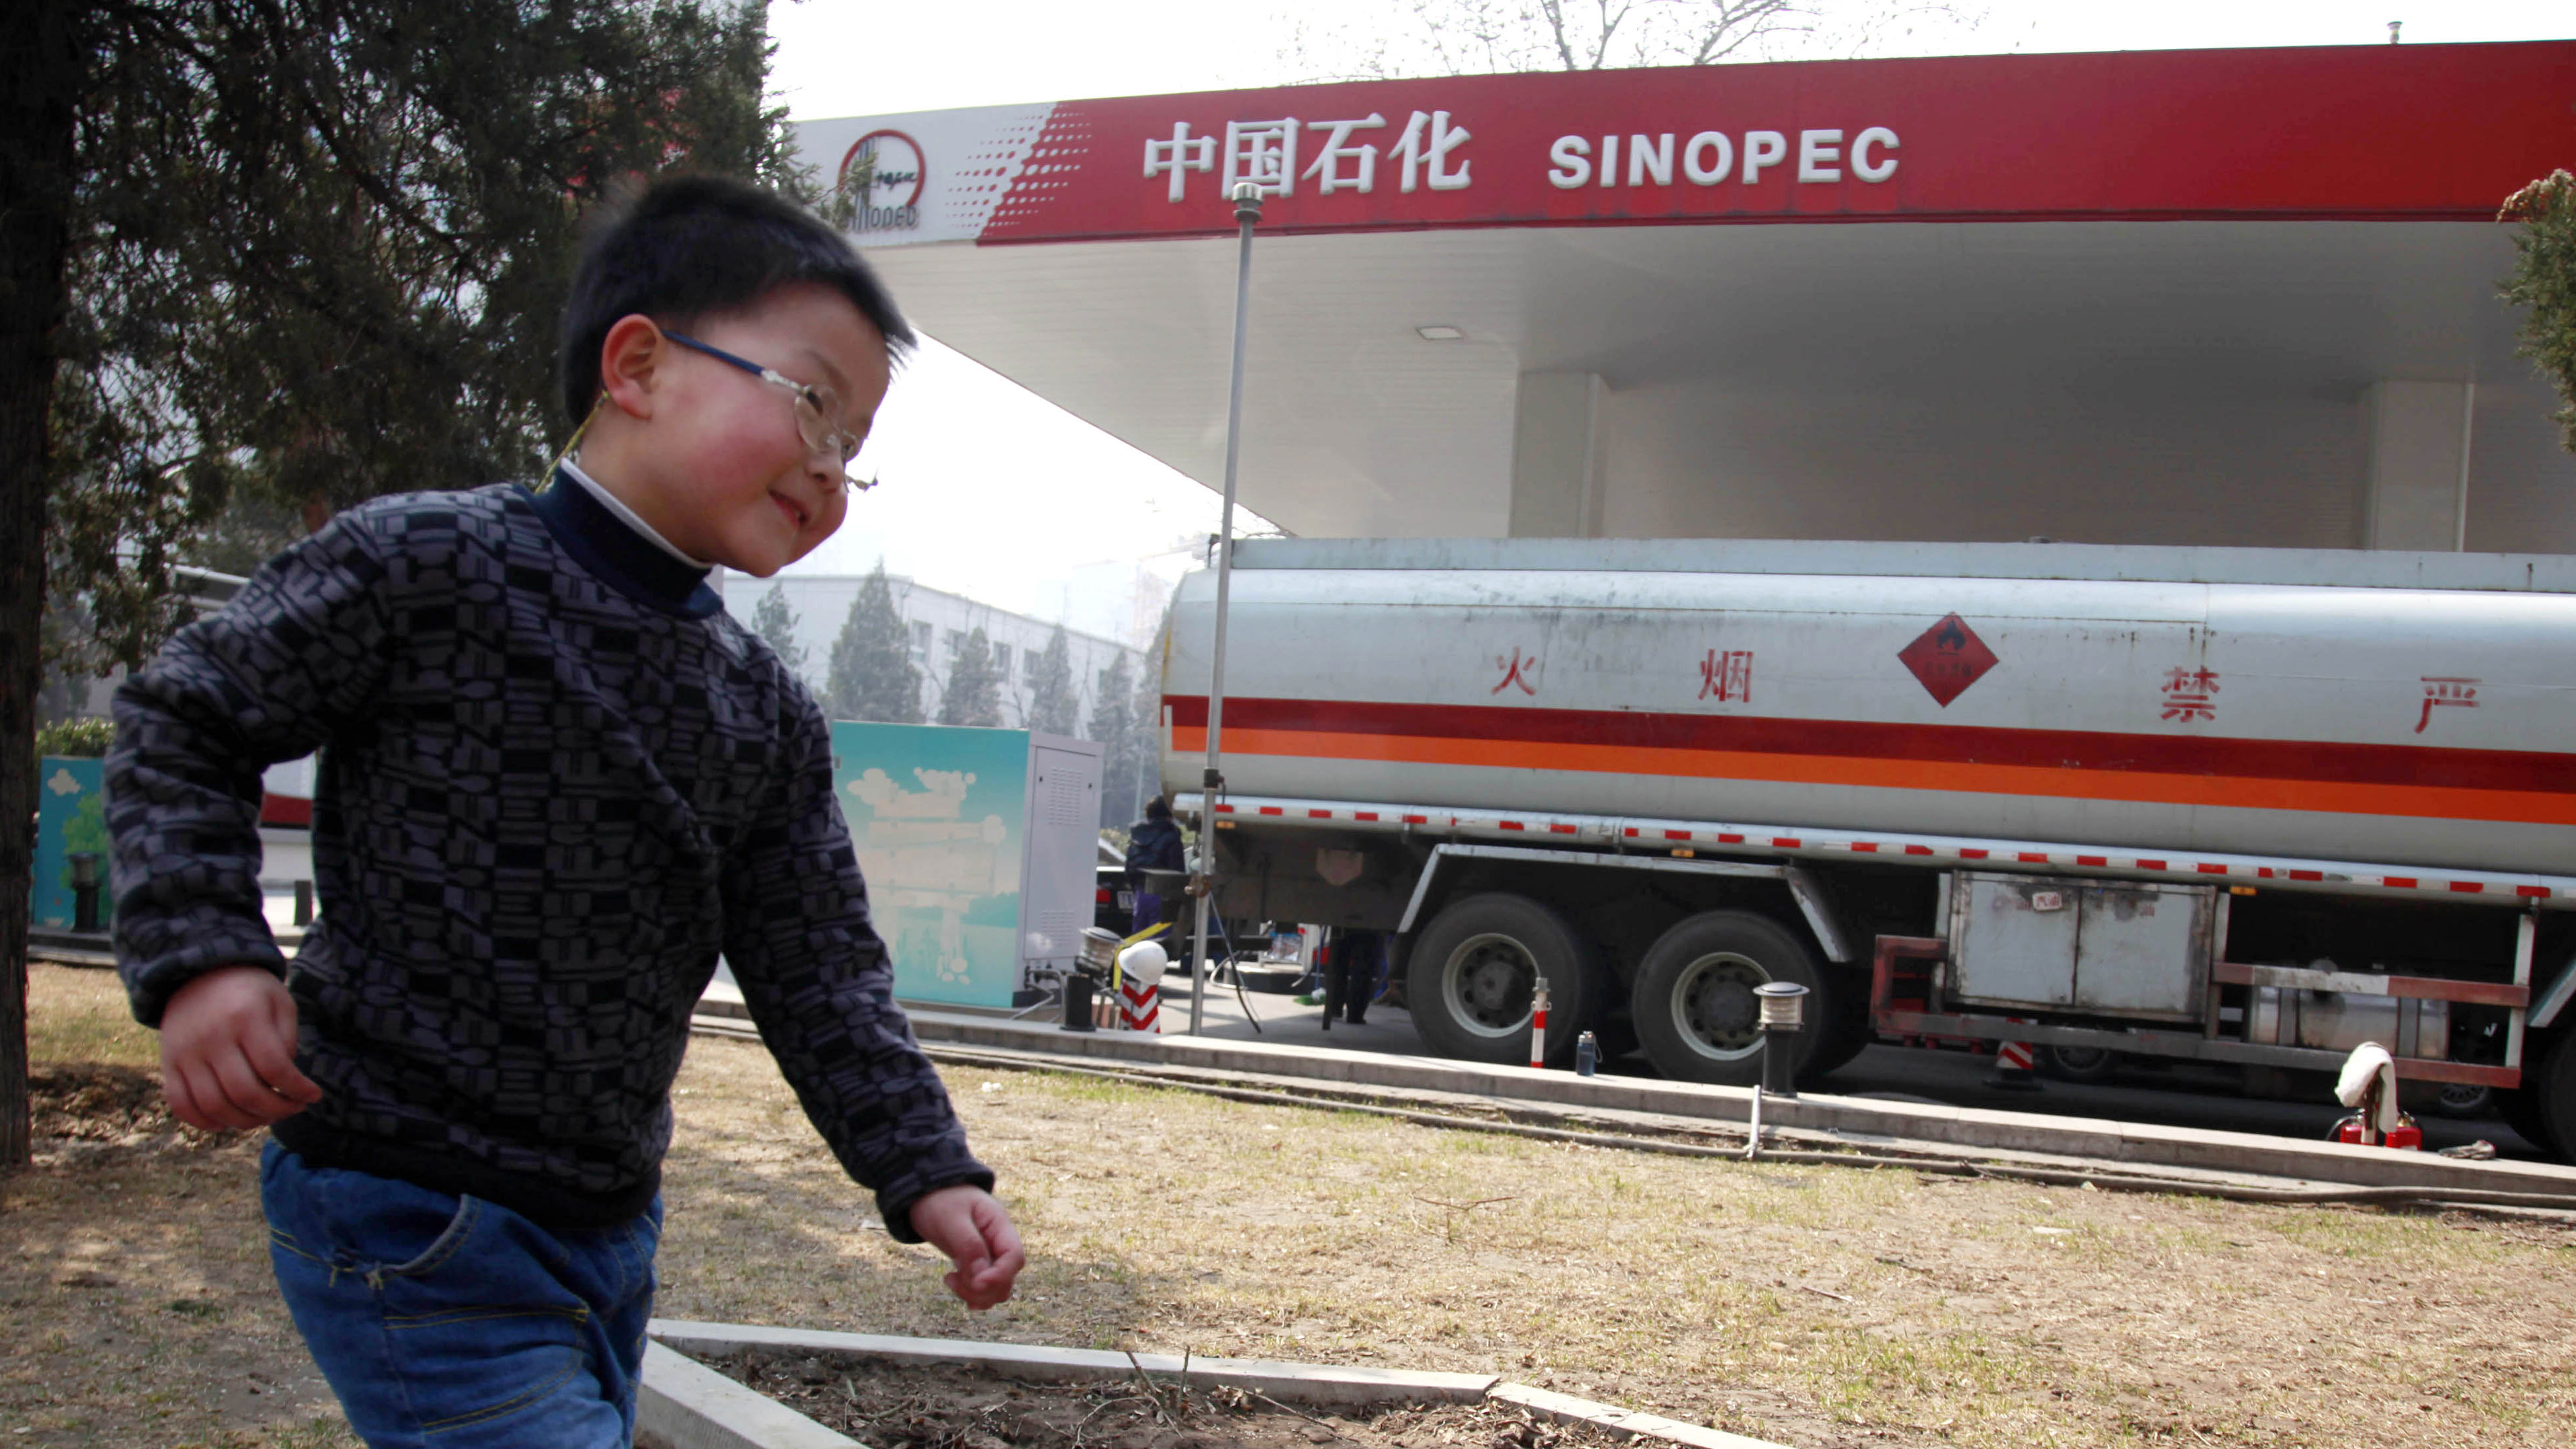 One of China's future asthmatics?